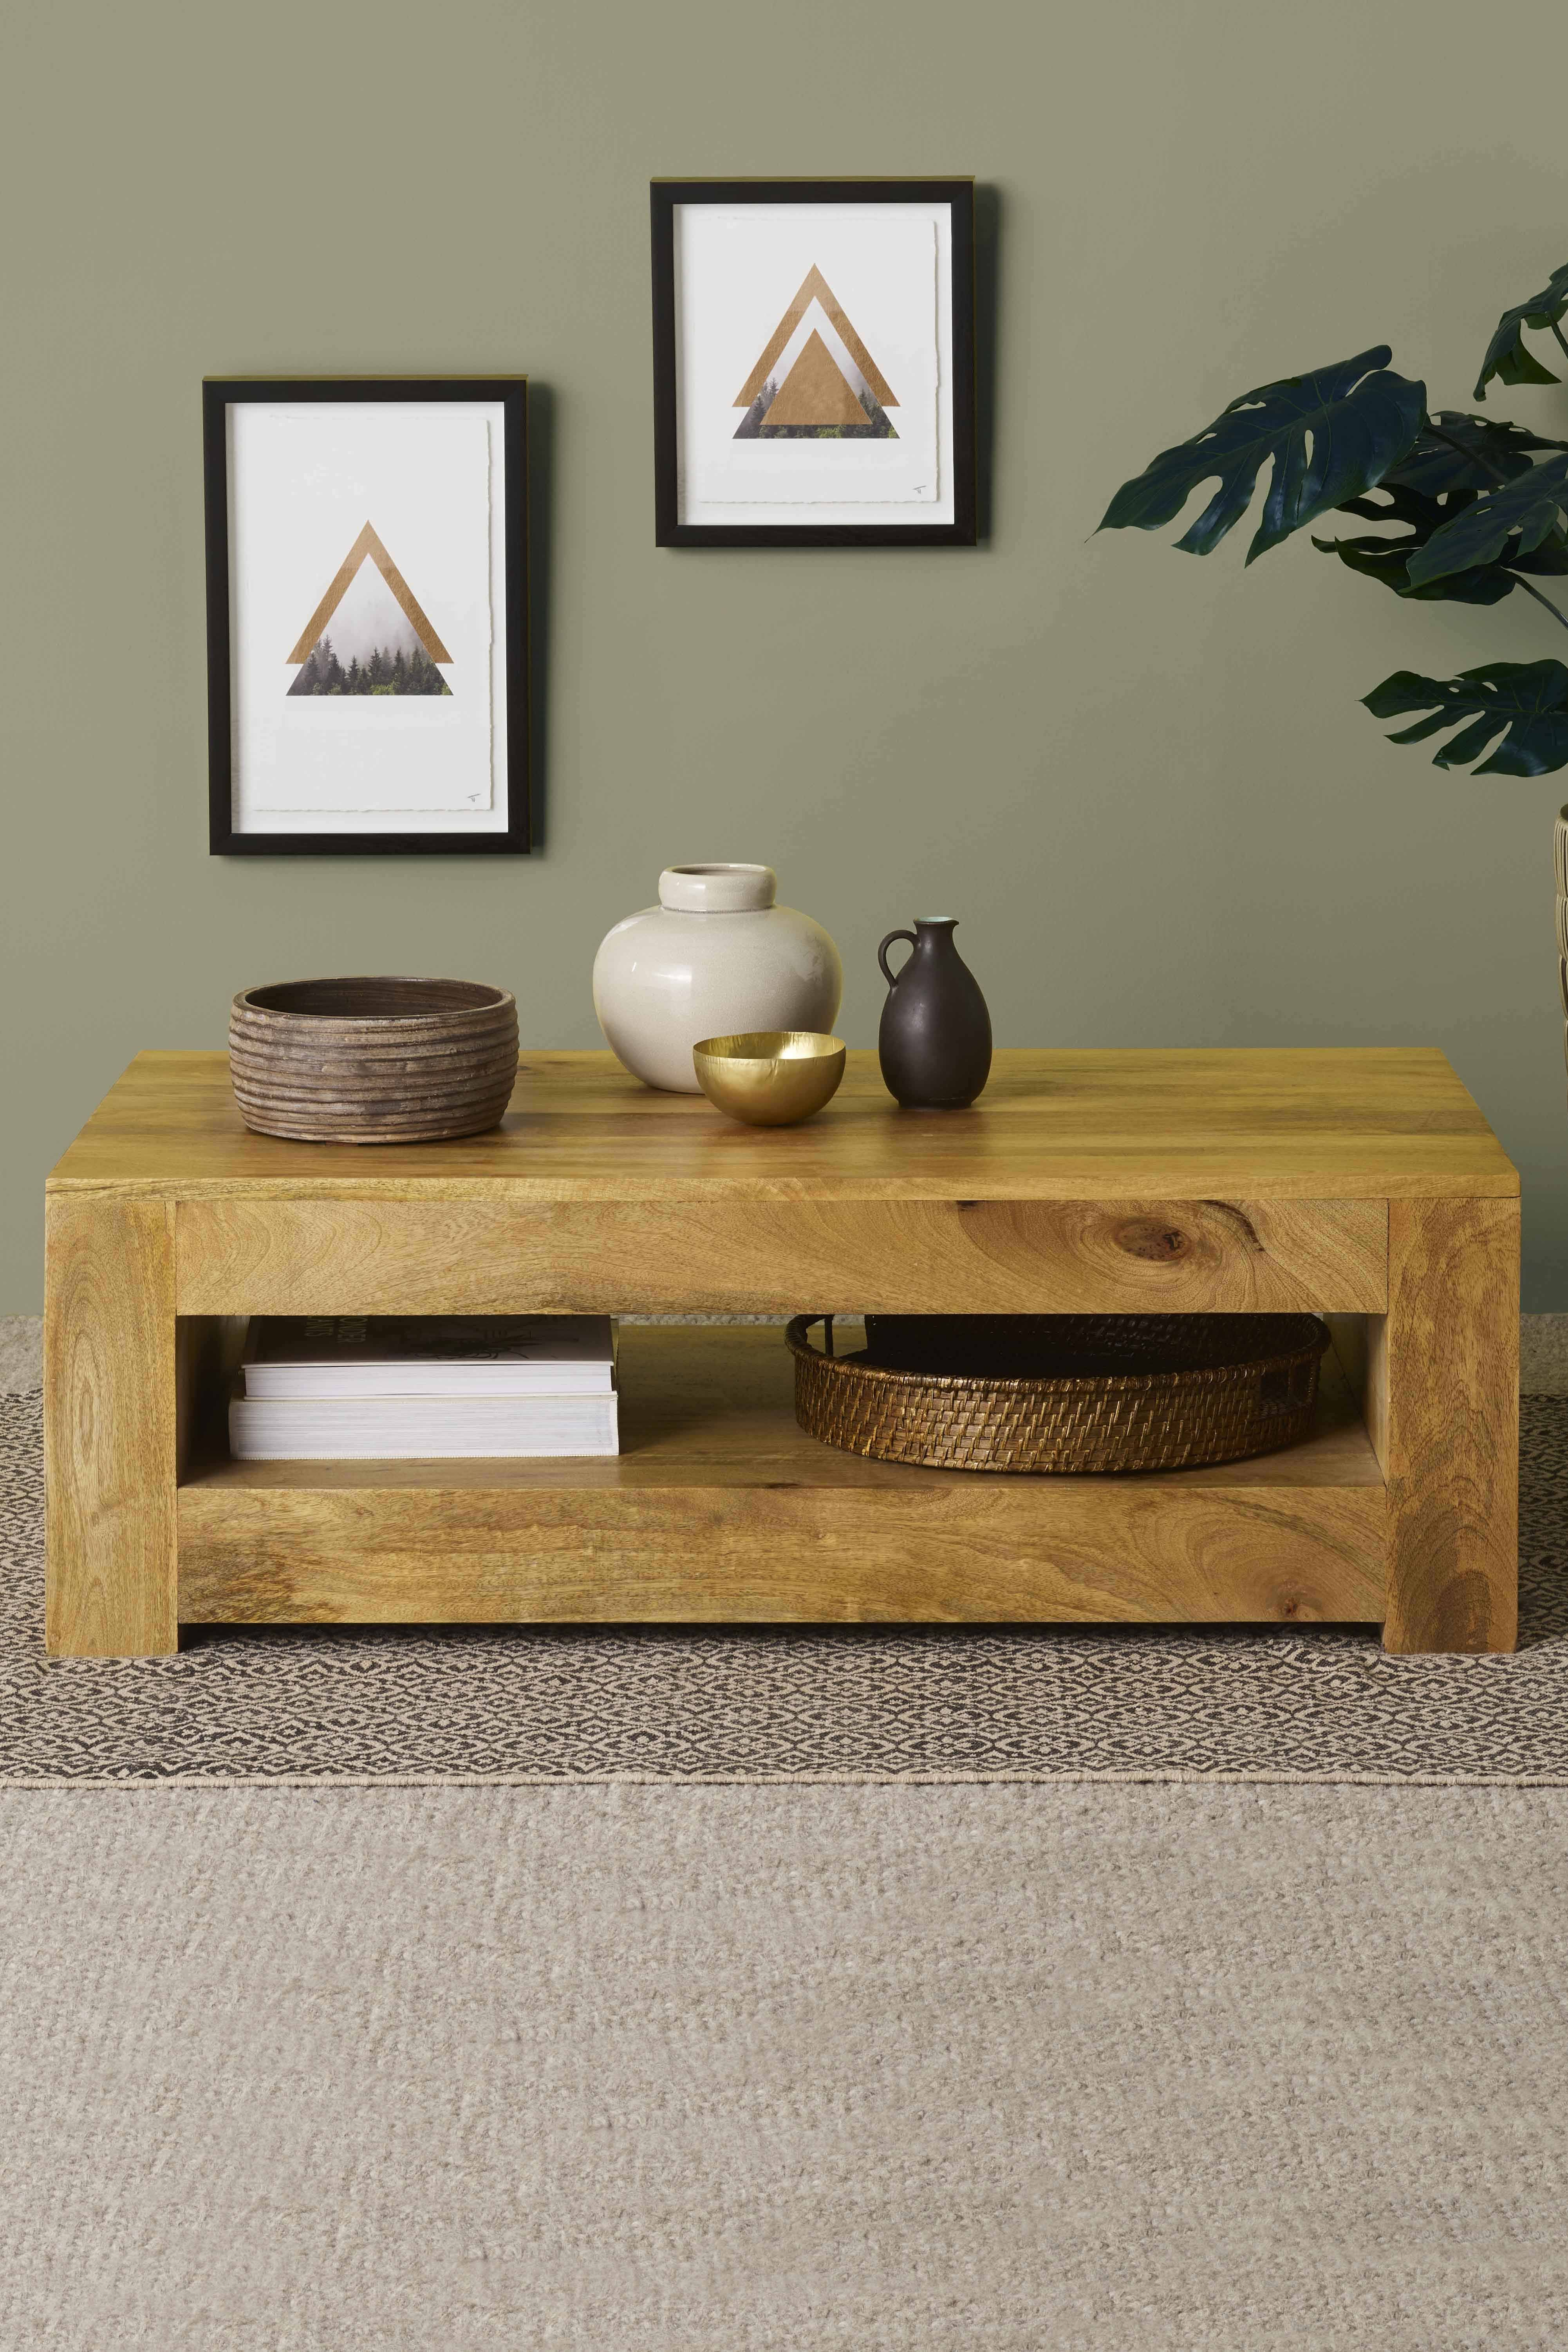 Pin By Lotje Kouwenberg On Living Room Coffee Table Table Oak Furniture Land [ 6006 x 4004 Pixel ]